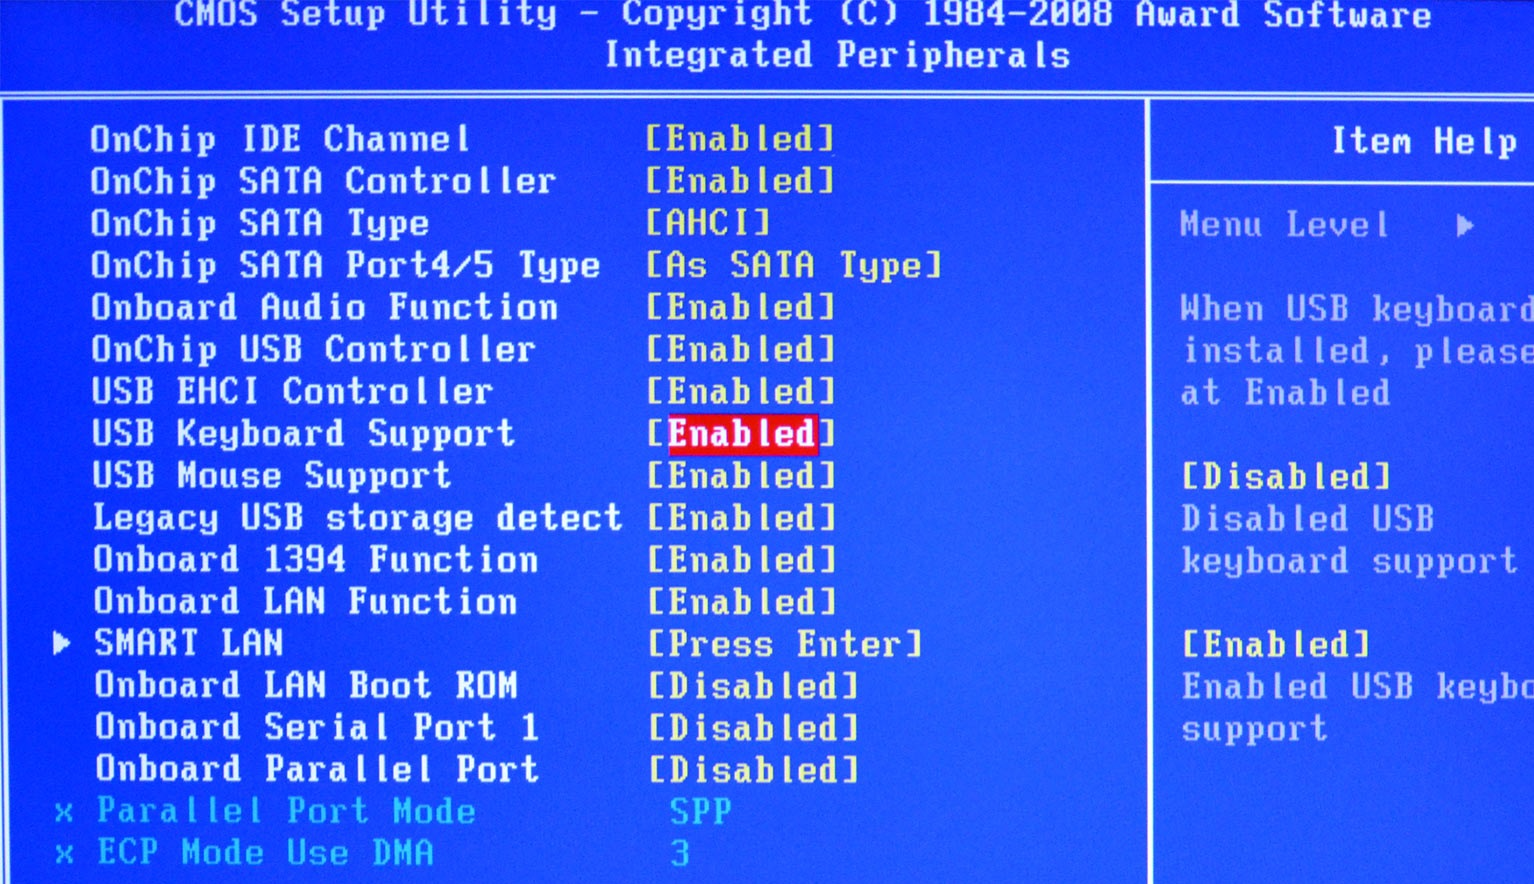 USB-Keyboard-Support